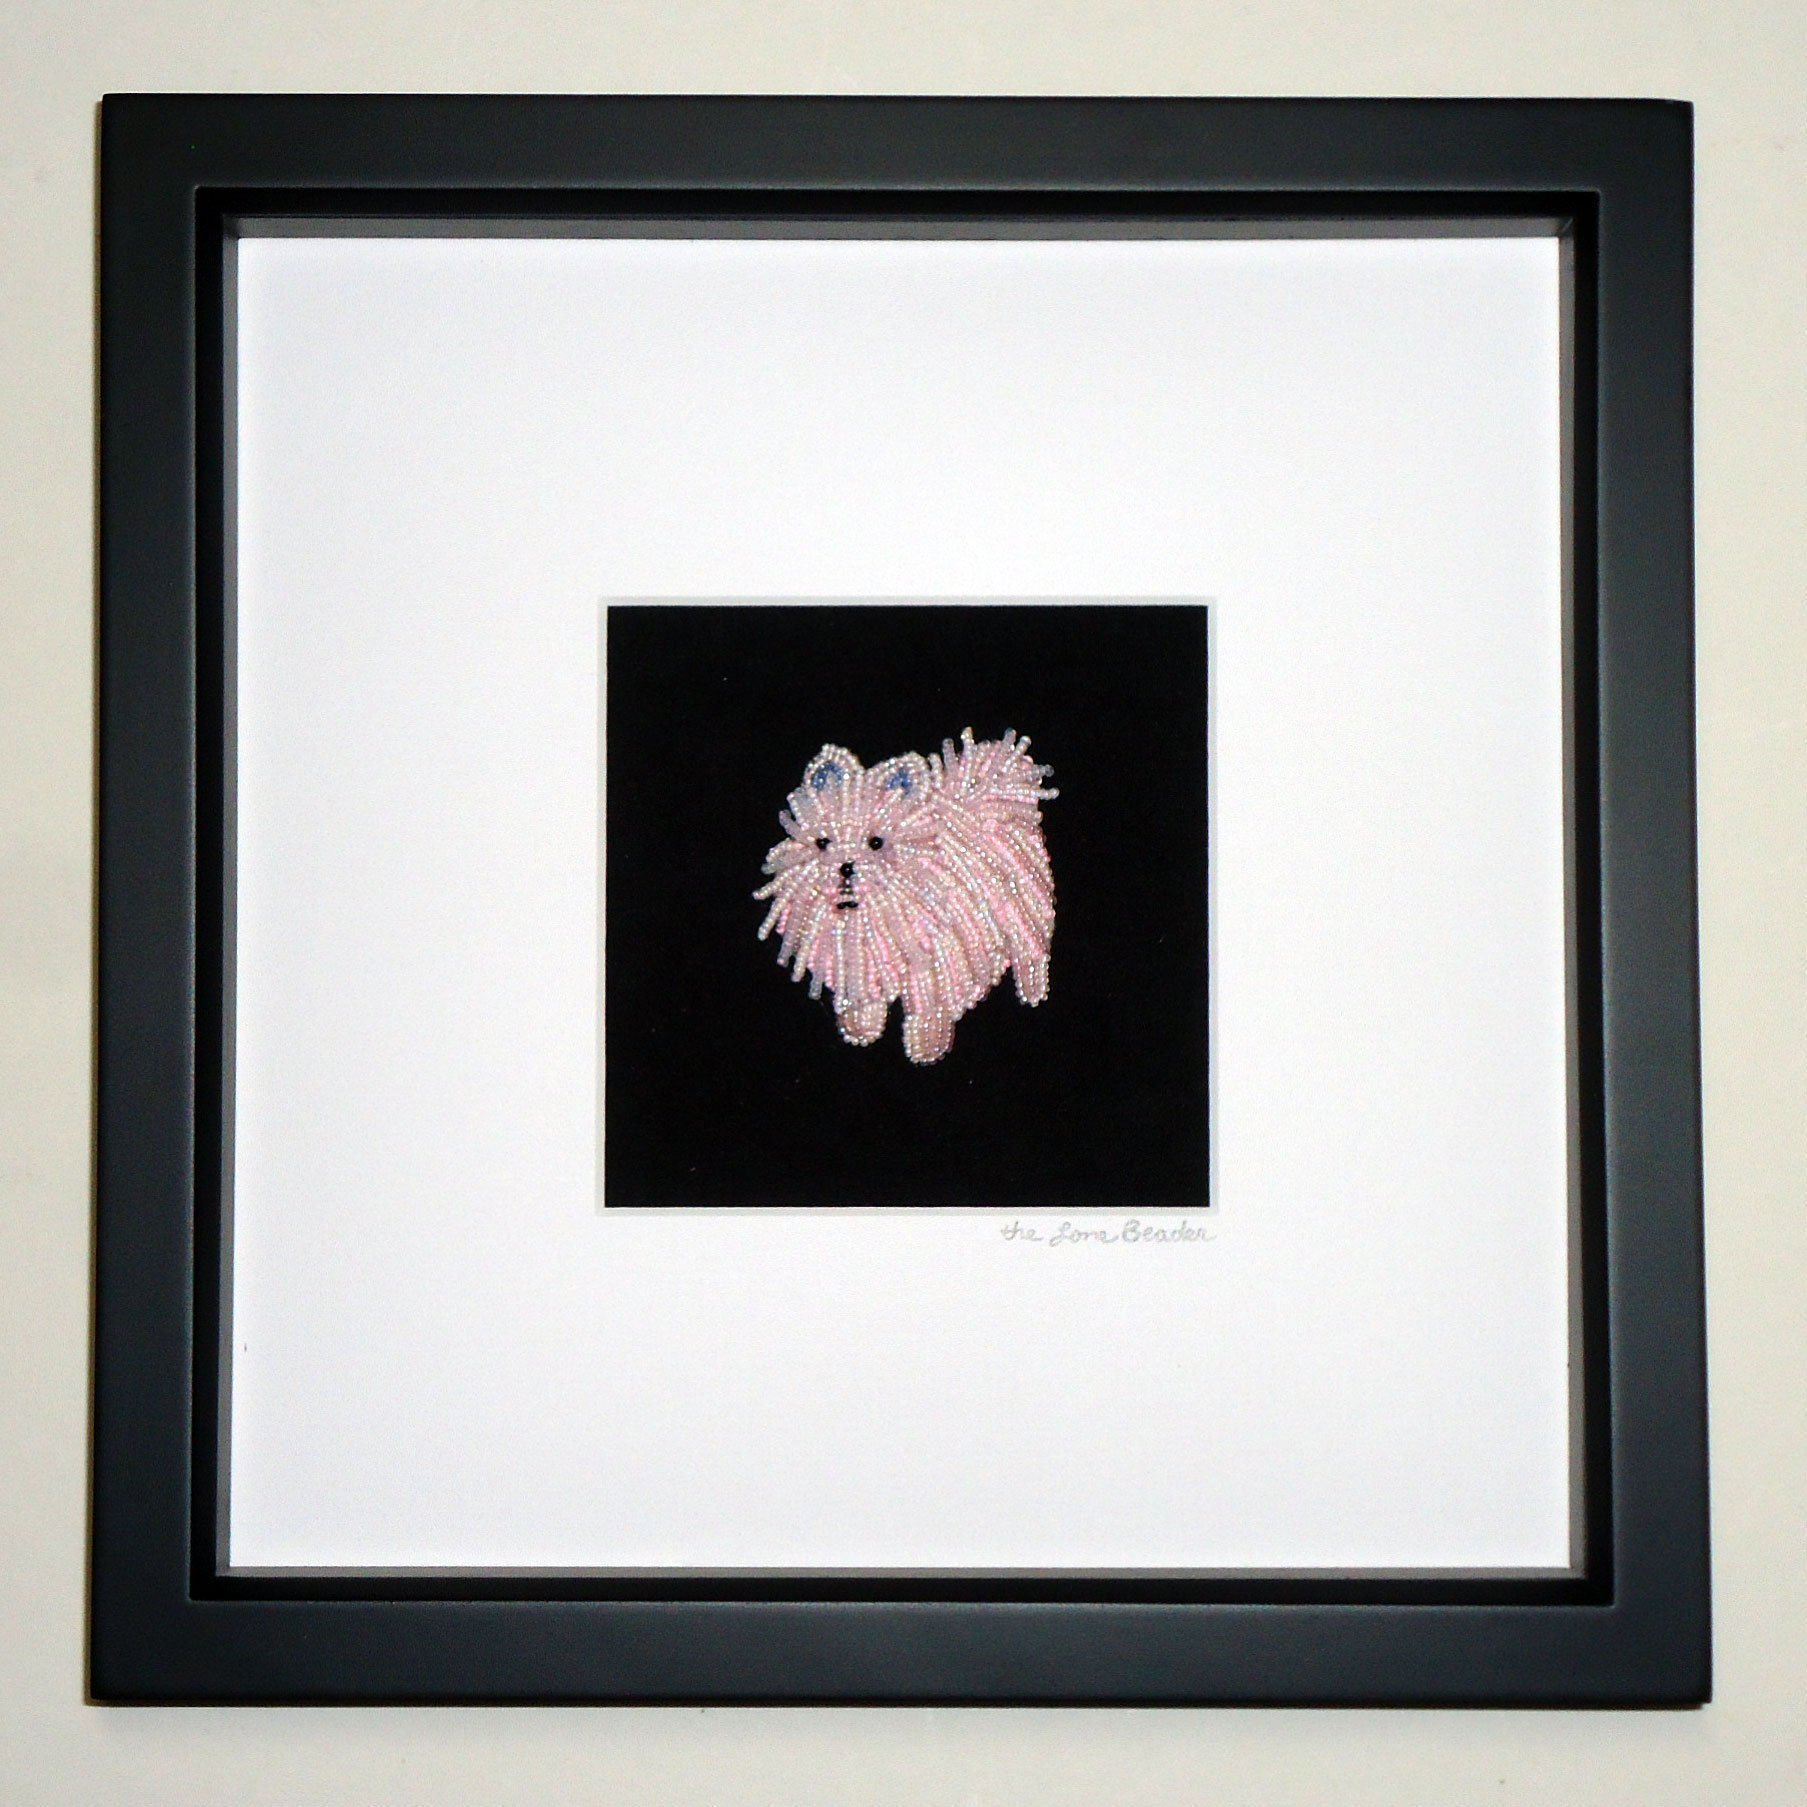 Pink or White POMERANIAN Beaded Mini Pet Portrait- Framed Dog Art- 8x8 shadowbox (Made to Order) (e)